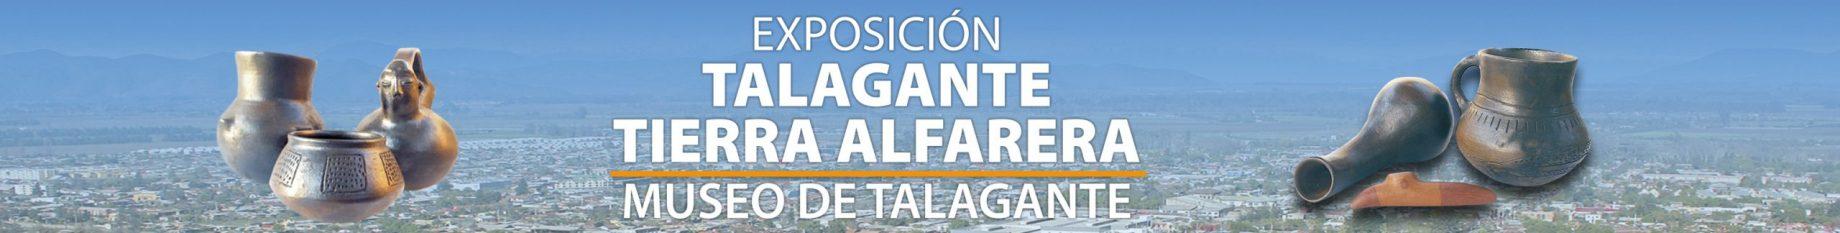 museo_de_talagante_exposición_talagante_tierra_alfarera_vb_